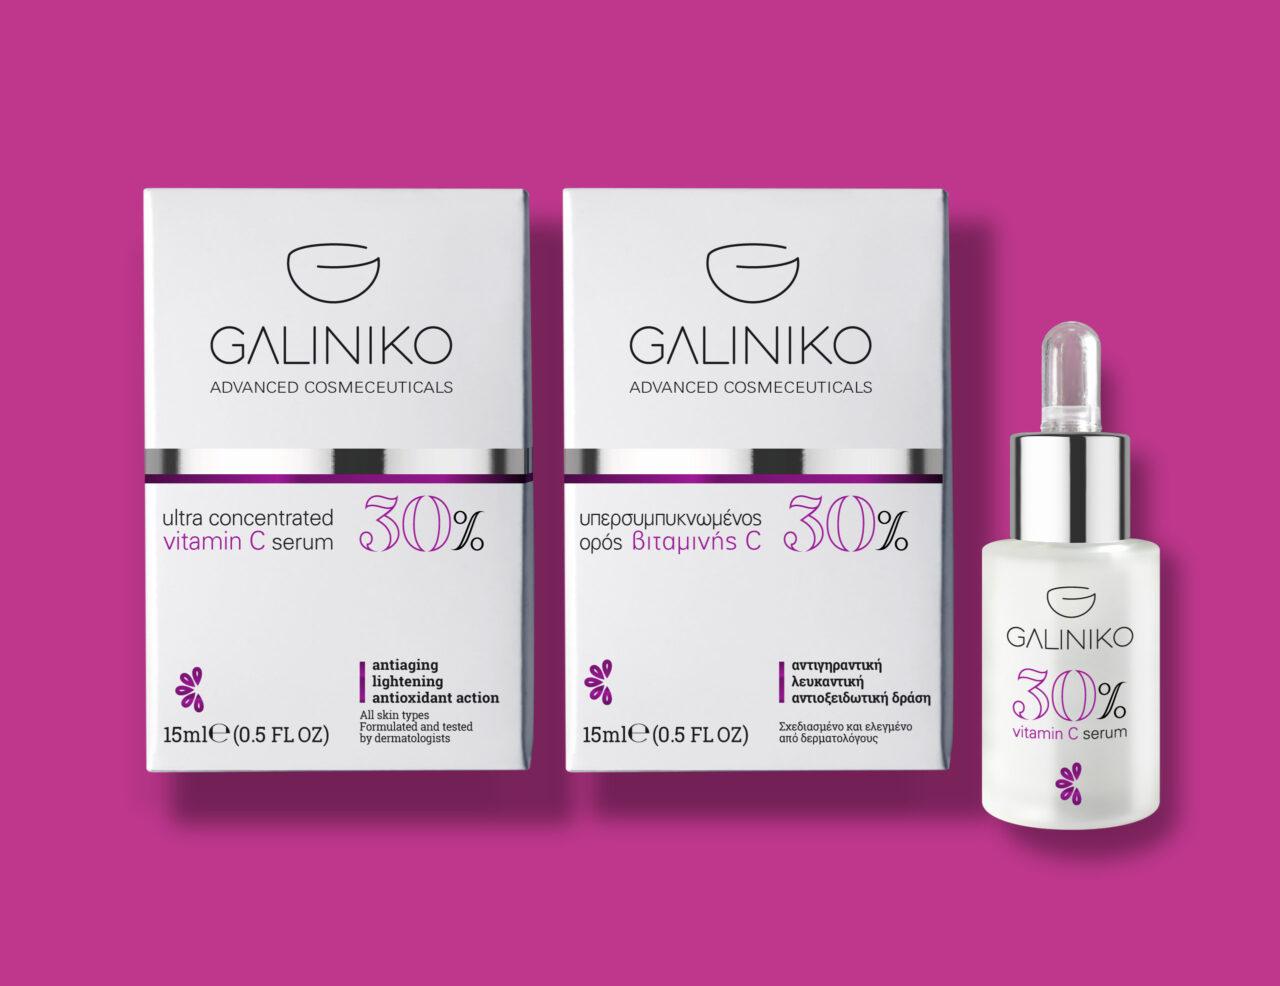 Galiniko advanced cosmeceuticals Vitamin C serum branding and packaging design